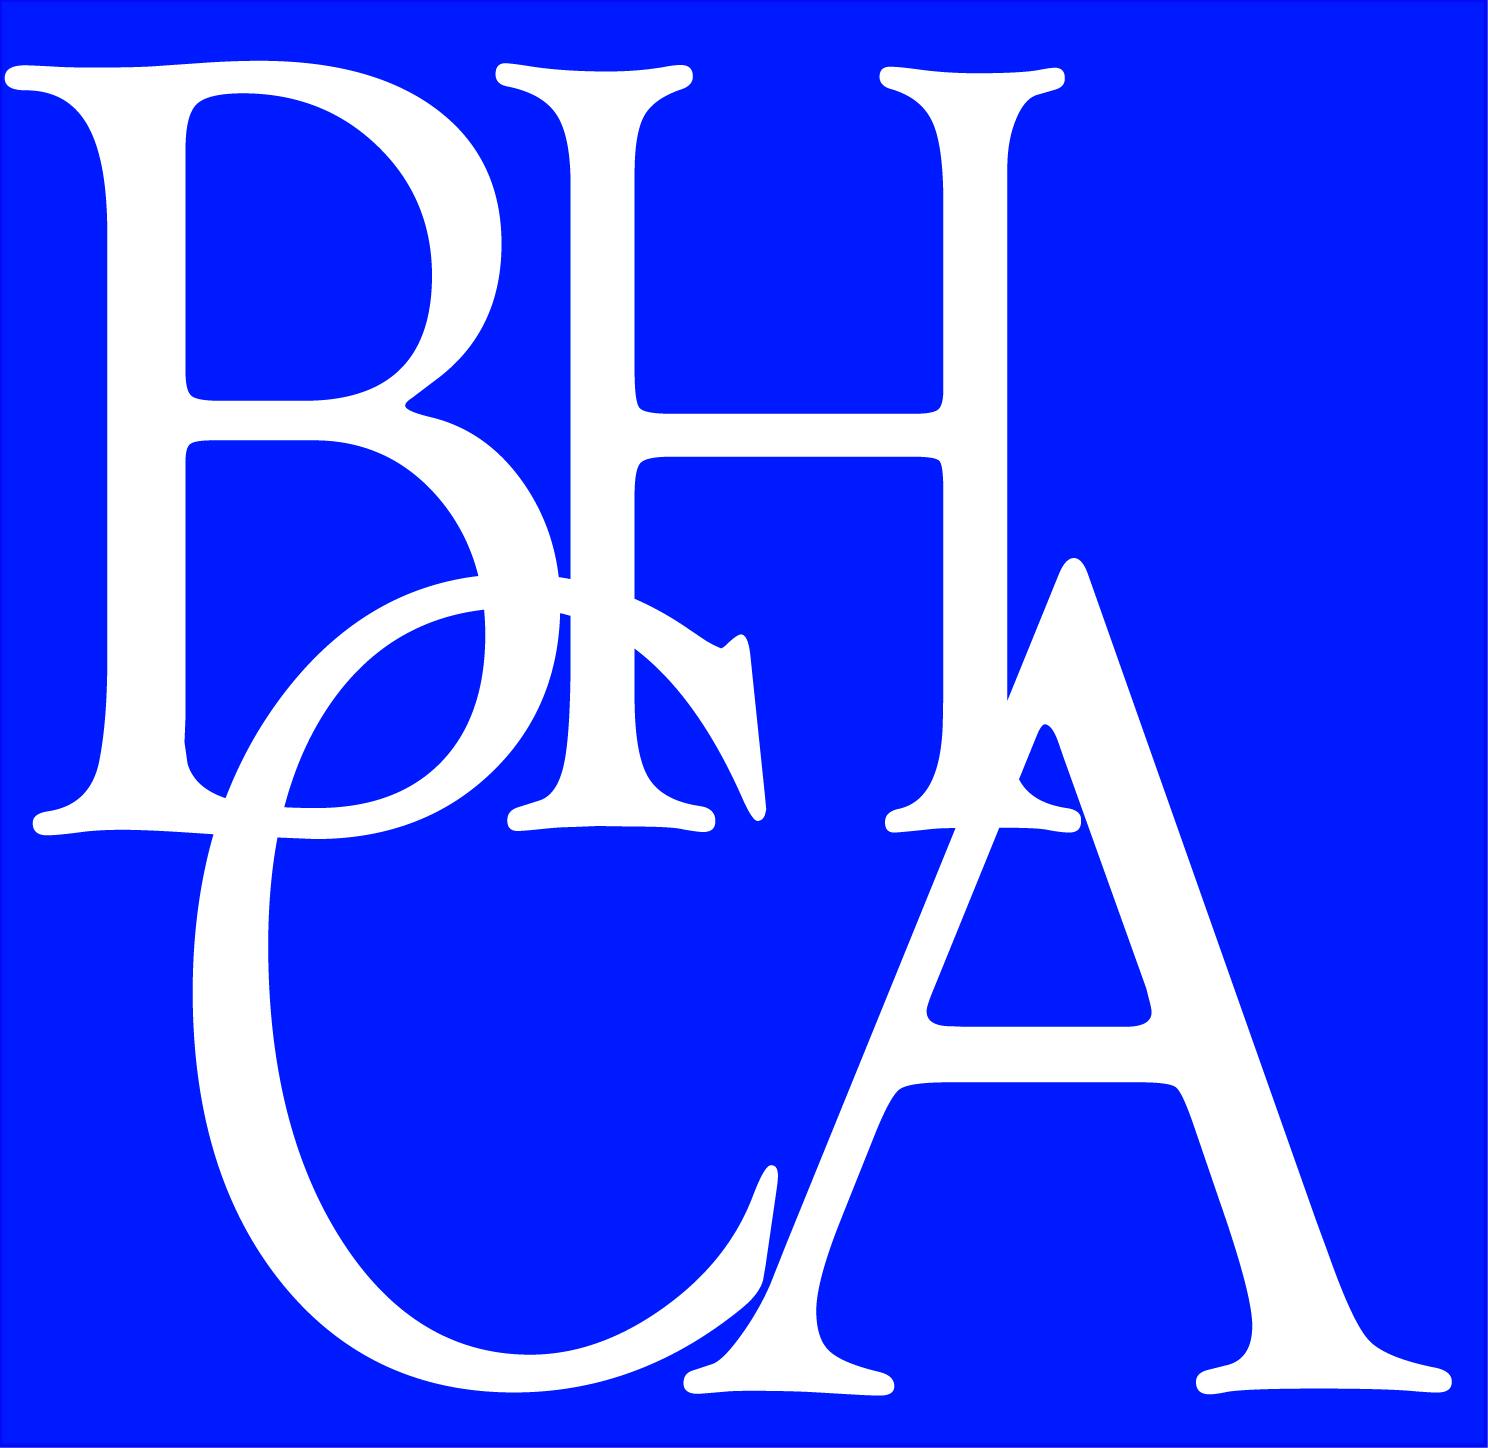 2.14 BHCA hi-rez logo